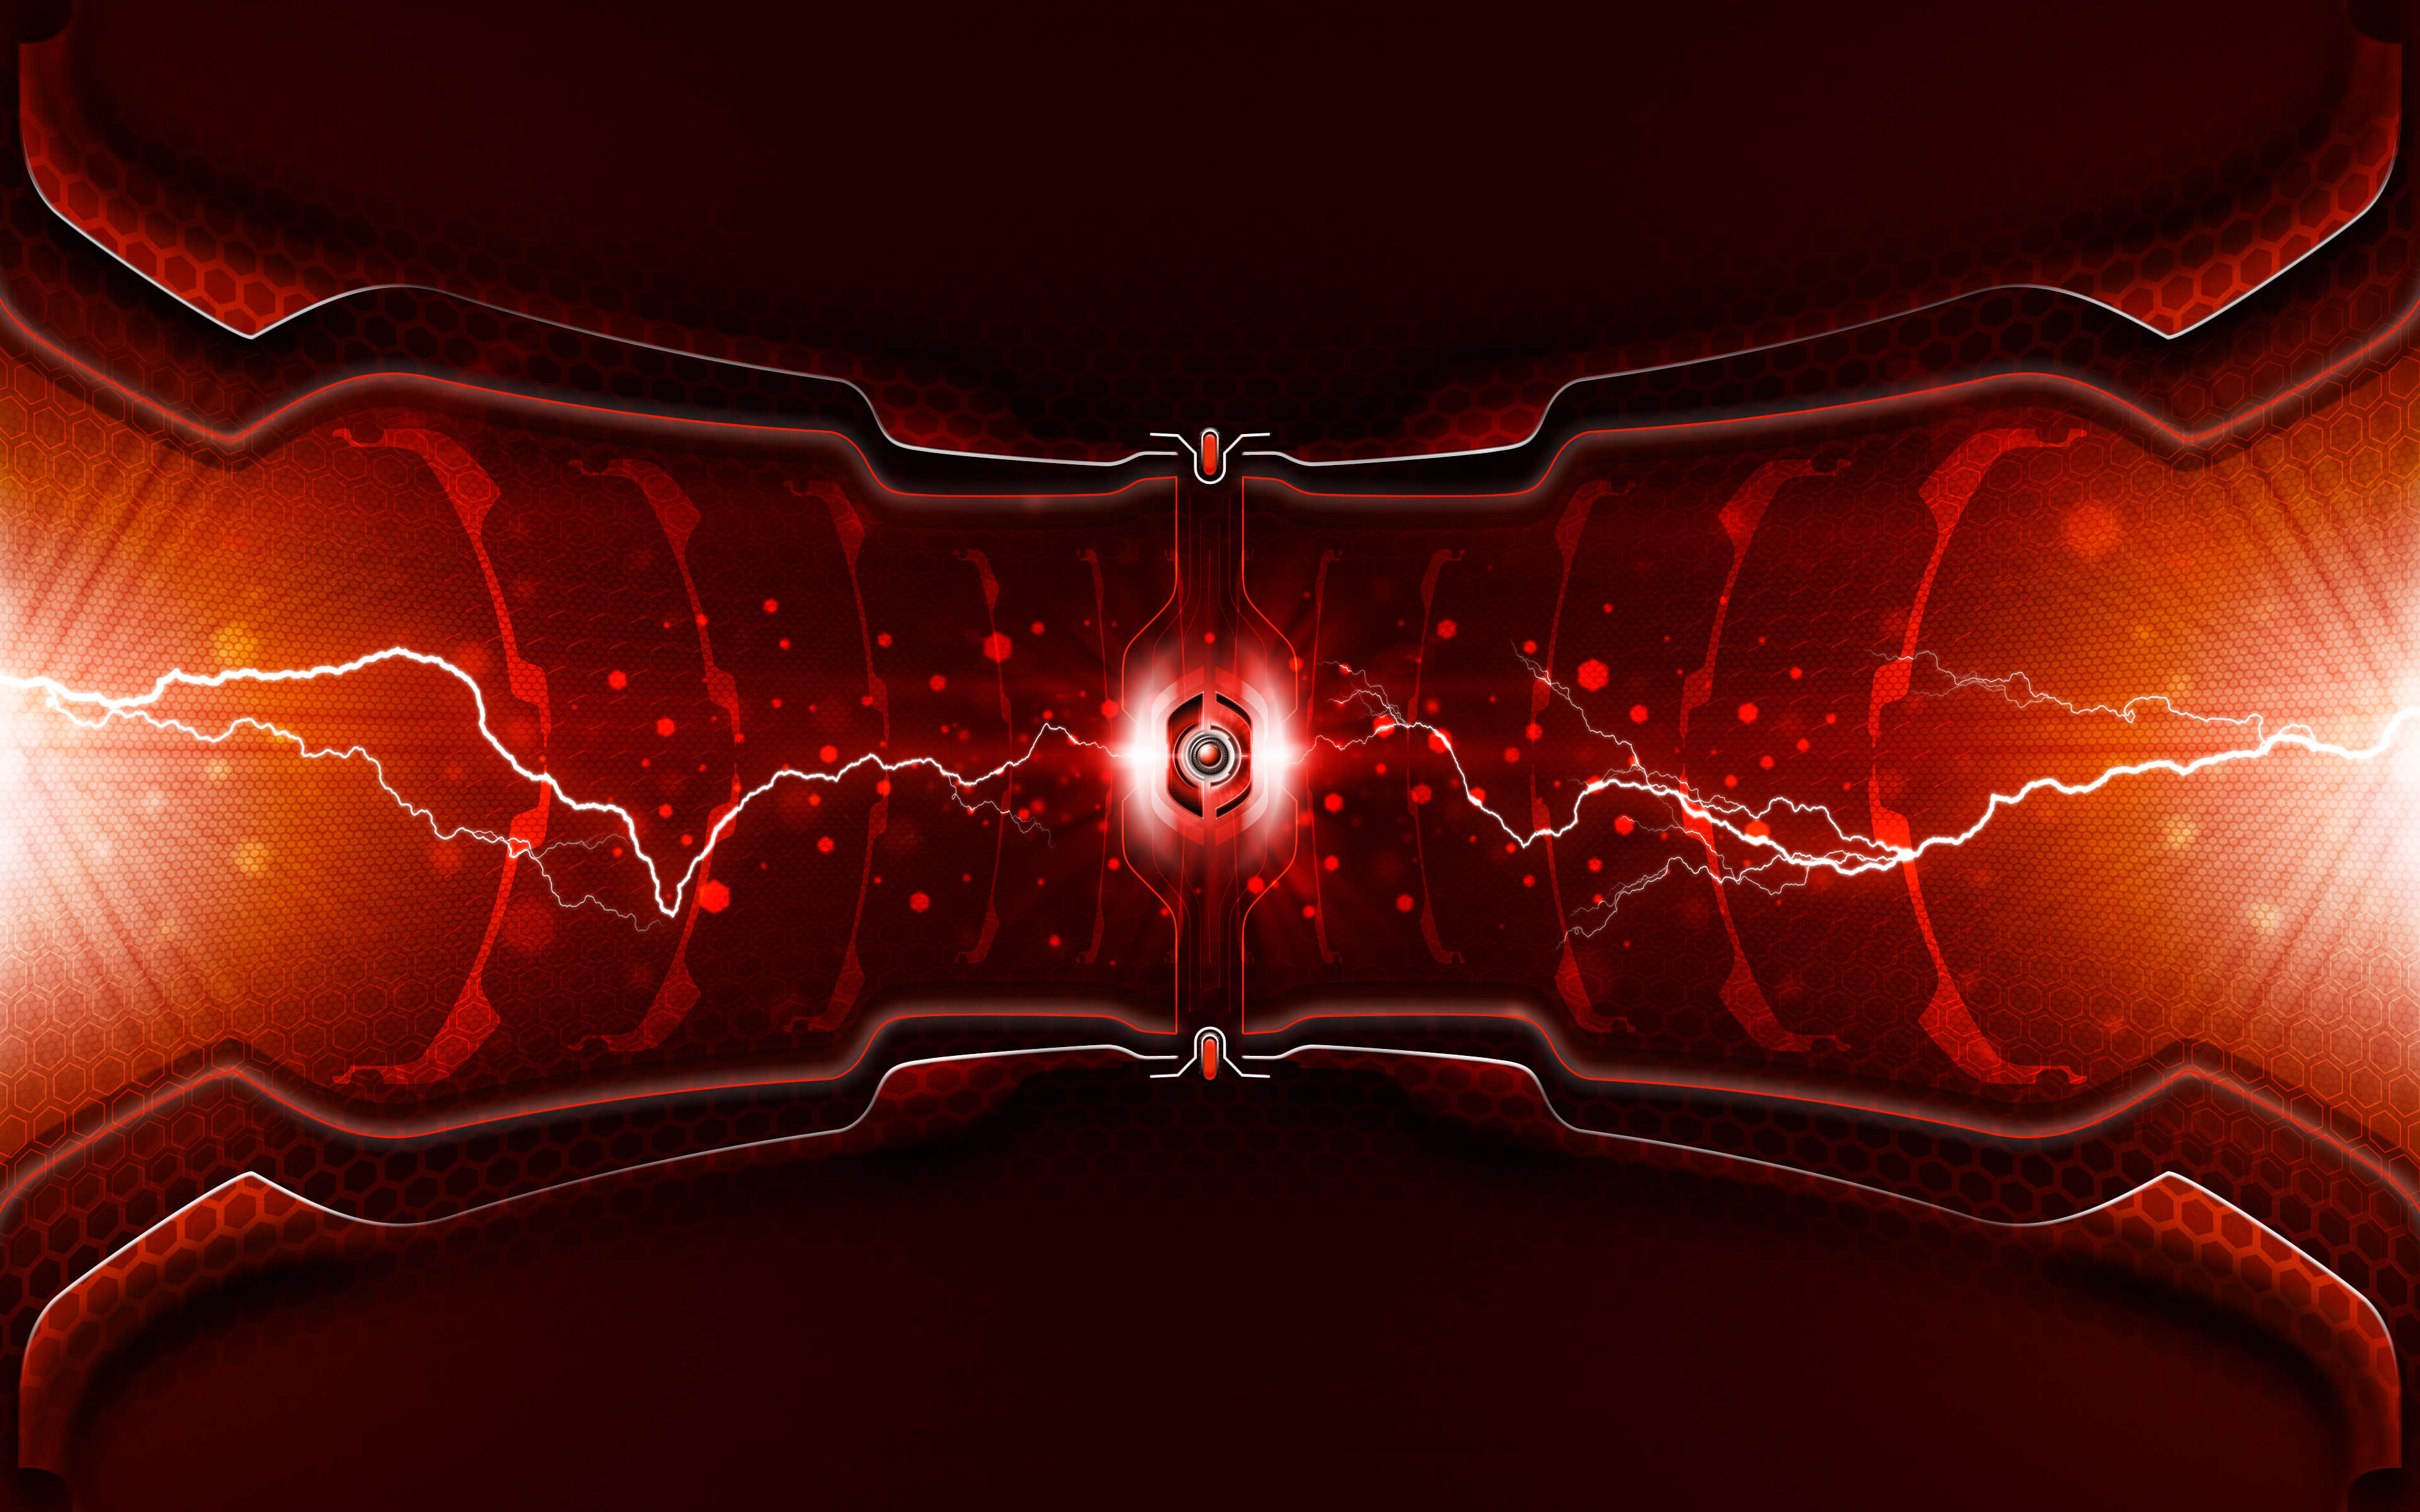 Rouge 4k ultra hd fond d 39 cran and arri re plan for Fond ecran style